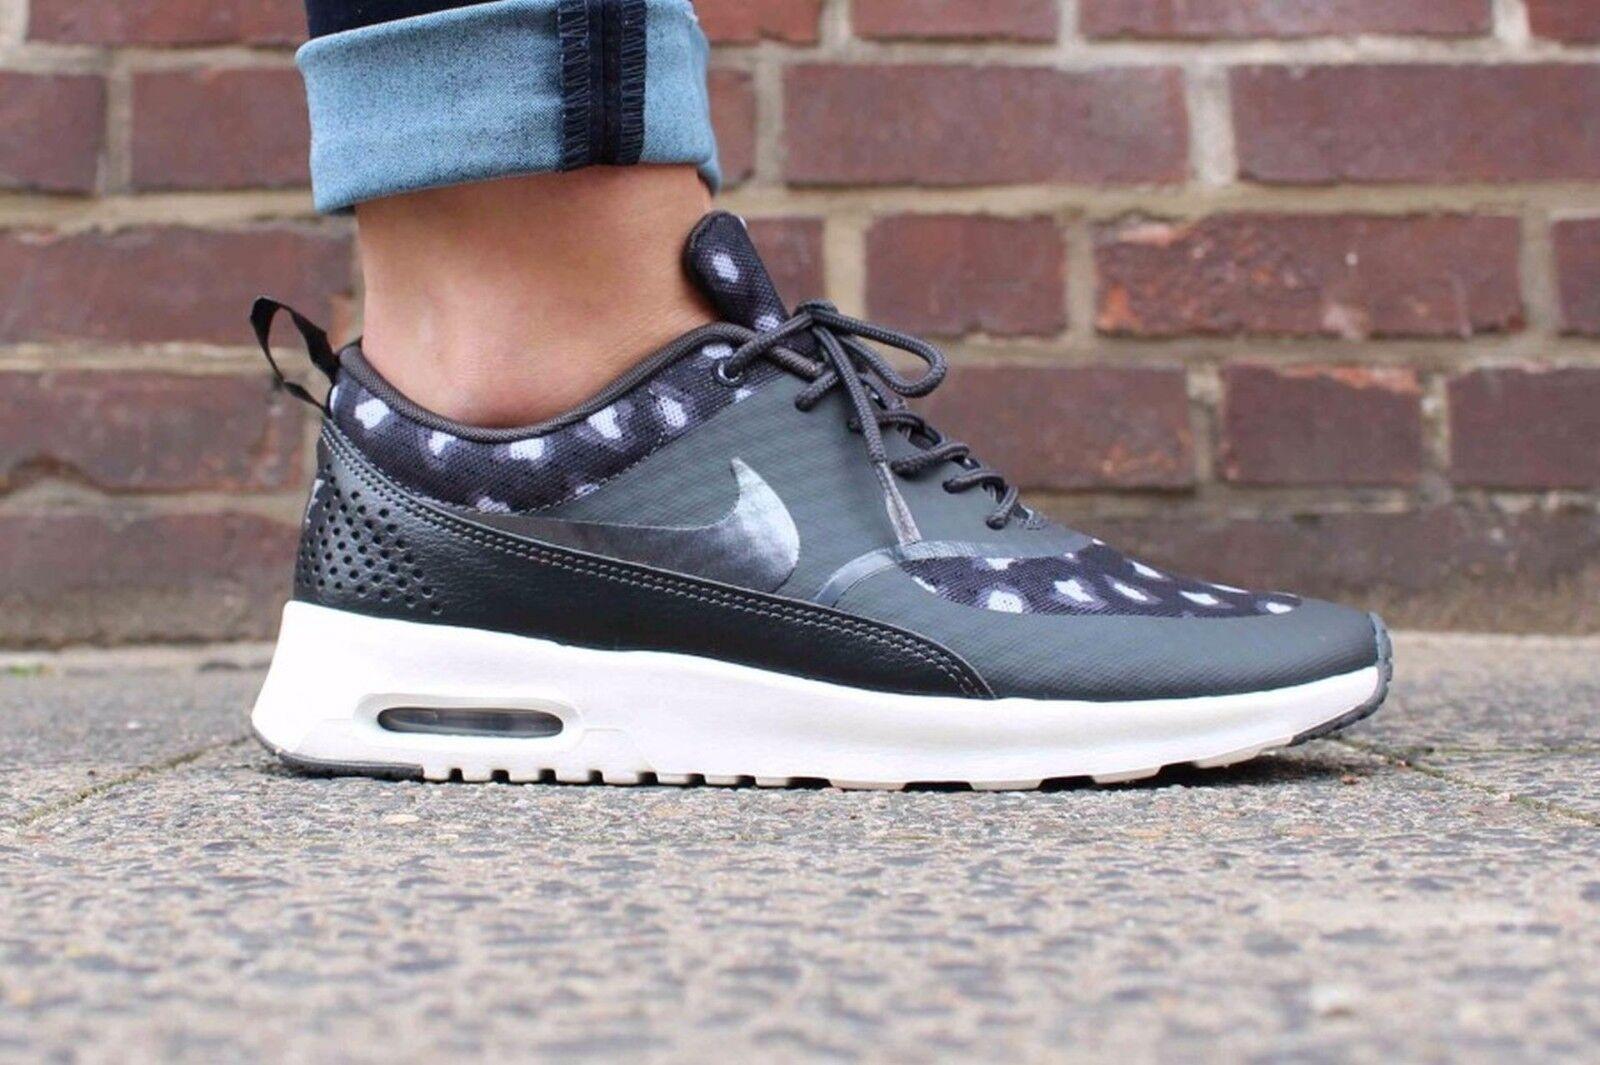 Nike Nike Nike Air Max Thea Print  Wmn Sz 11 599408-008 Black Dark Grey Anthracite Wolf Gr 2a34c8